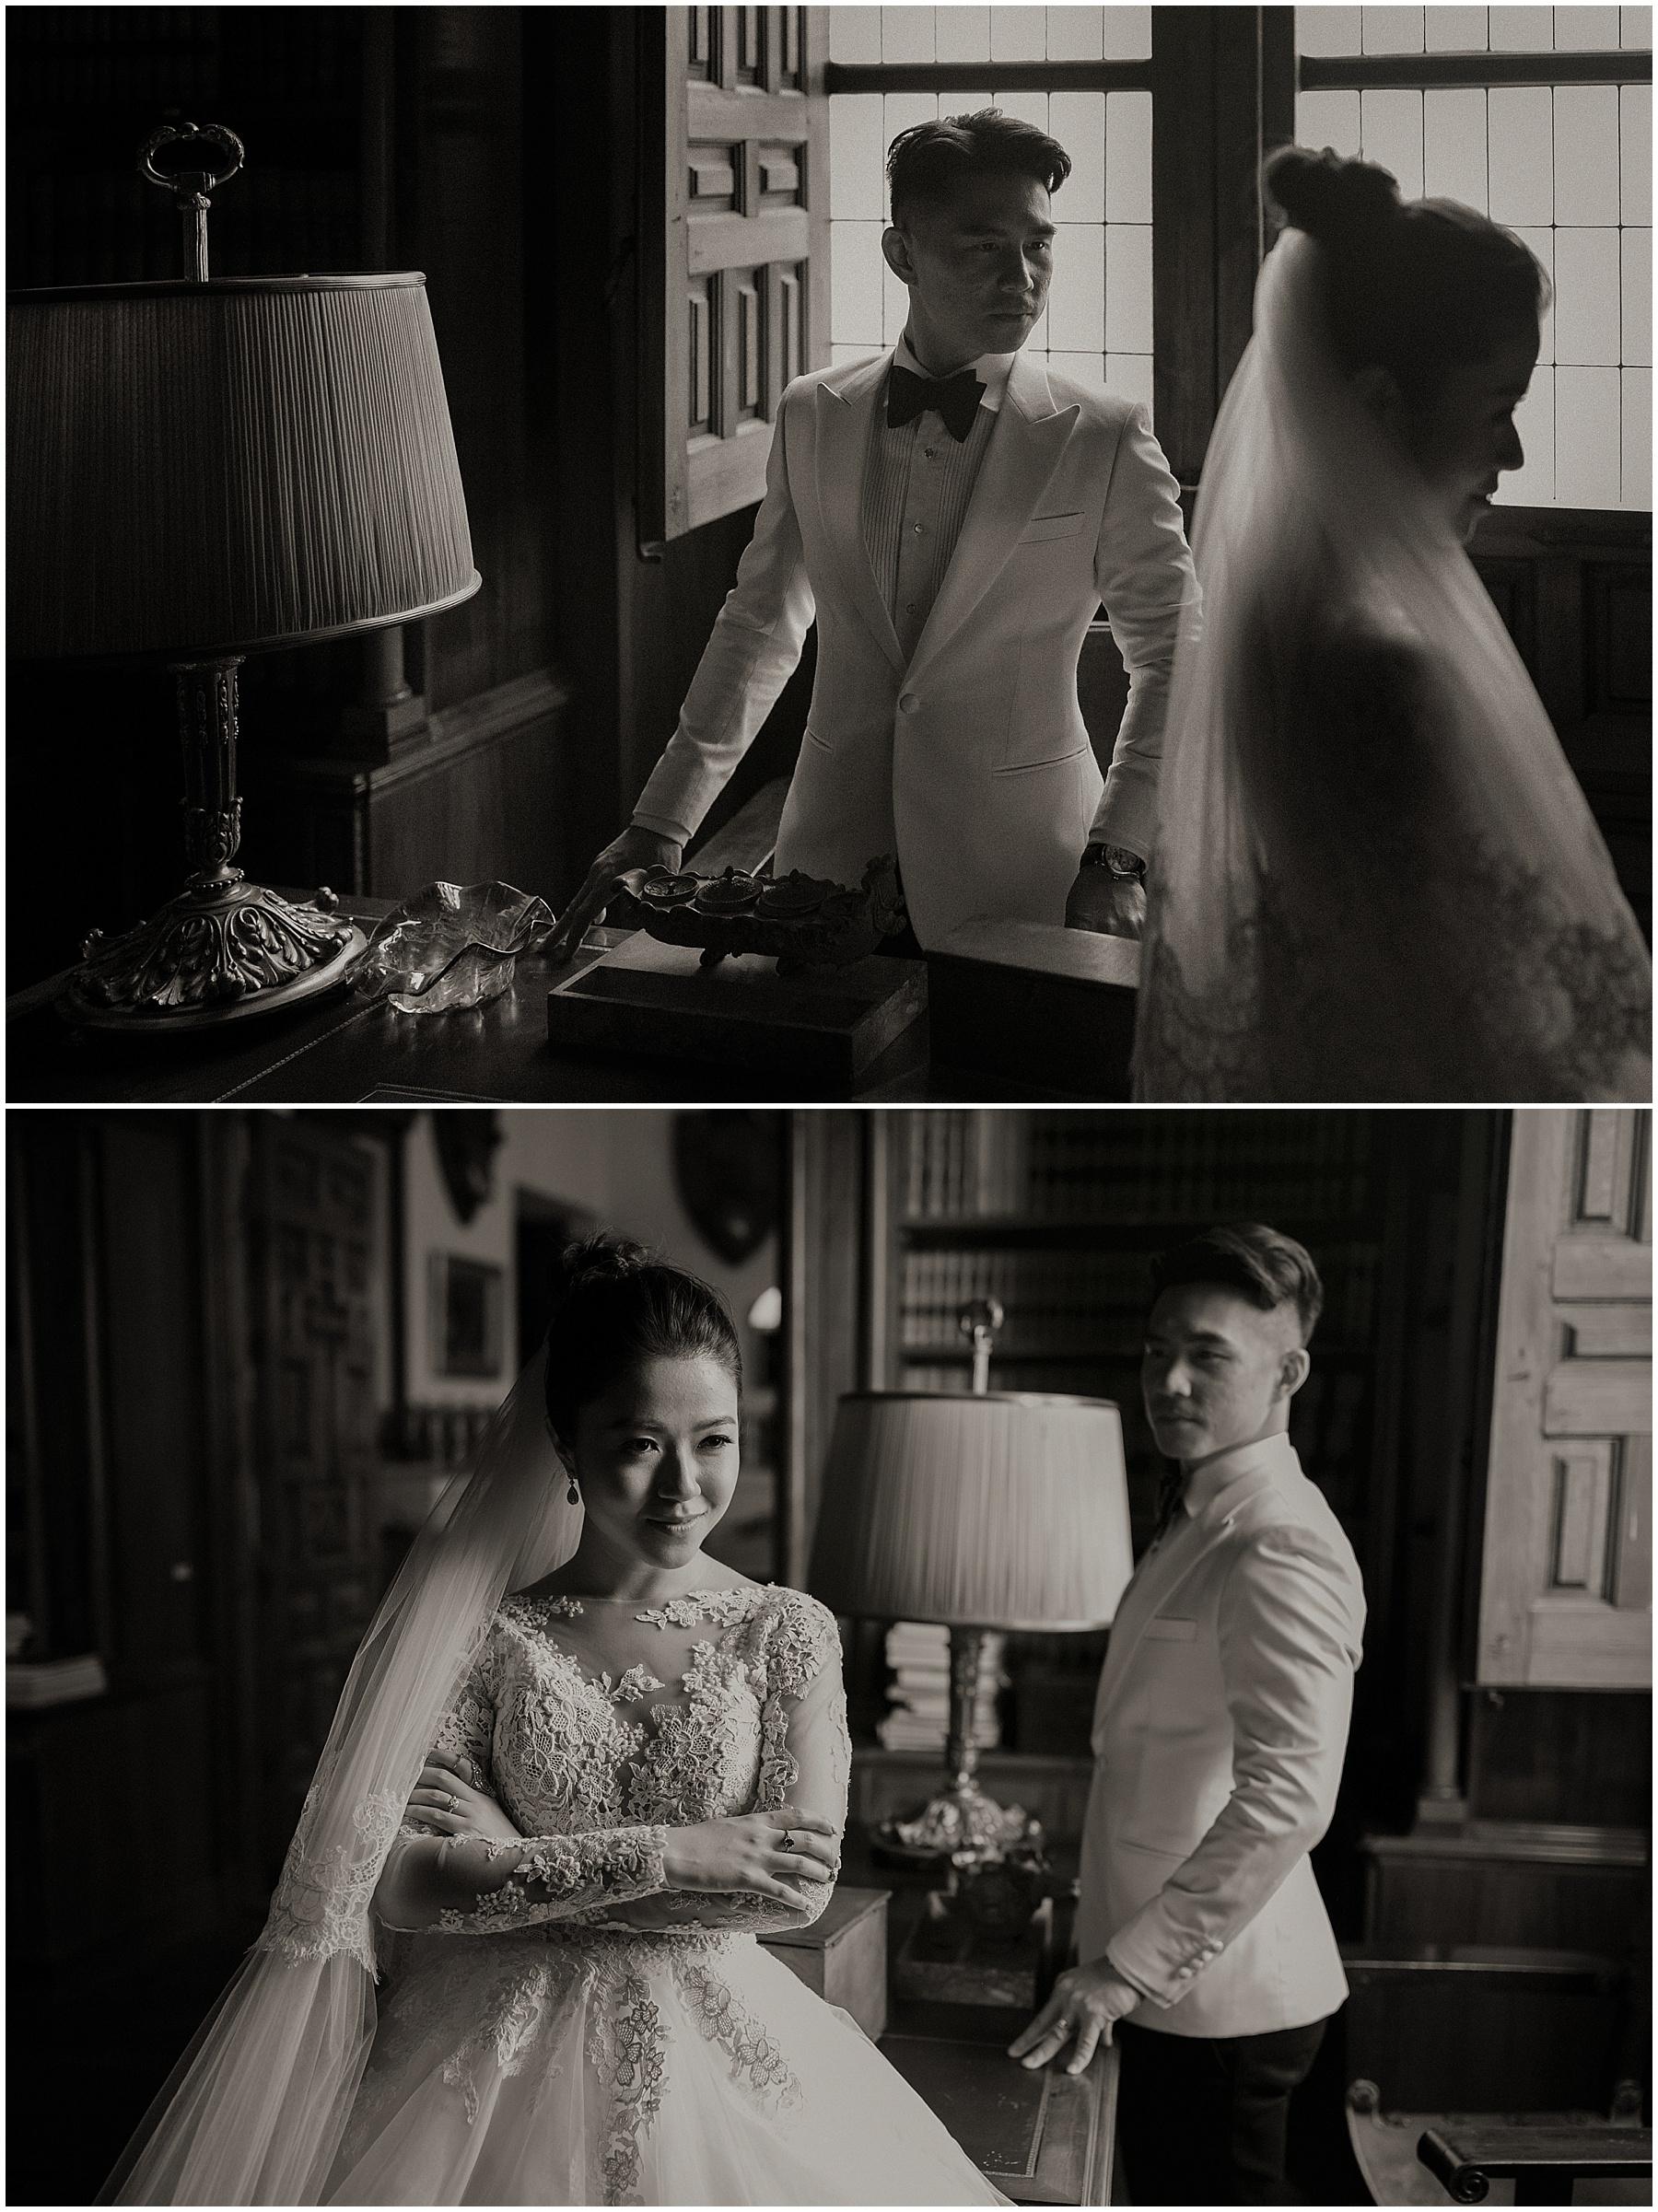 Malaysia wedding 019.JPG